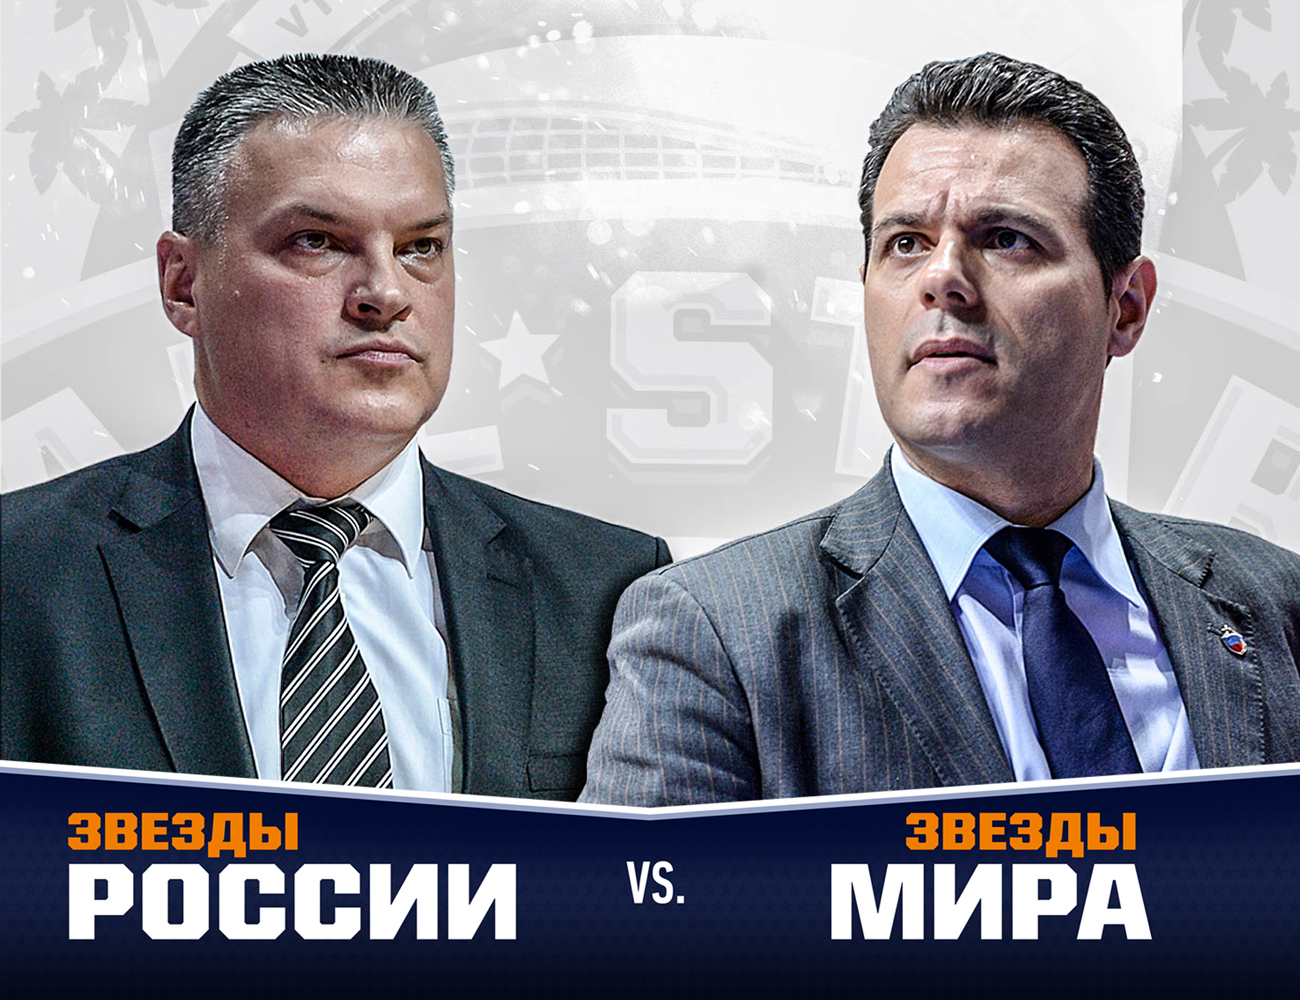 Евгений Пашутин и Димитрис Итудис станут главными тренерами на Матче Всех Звезд